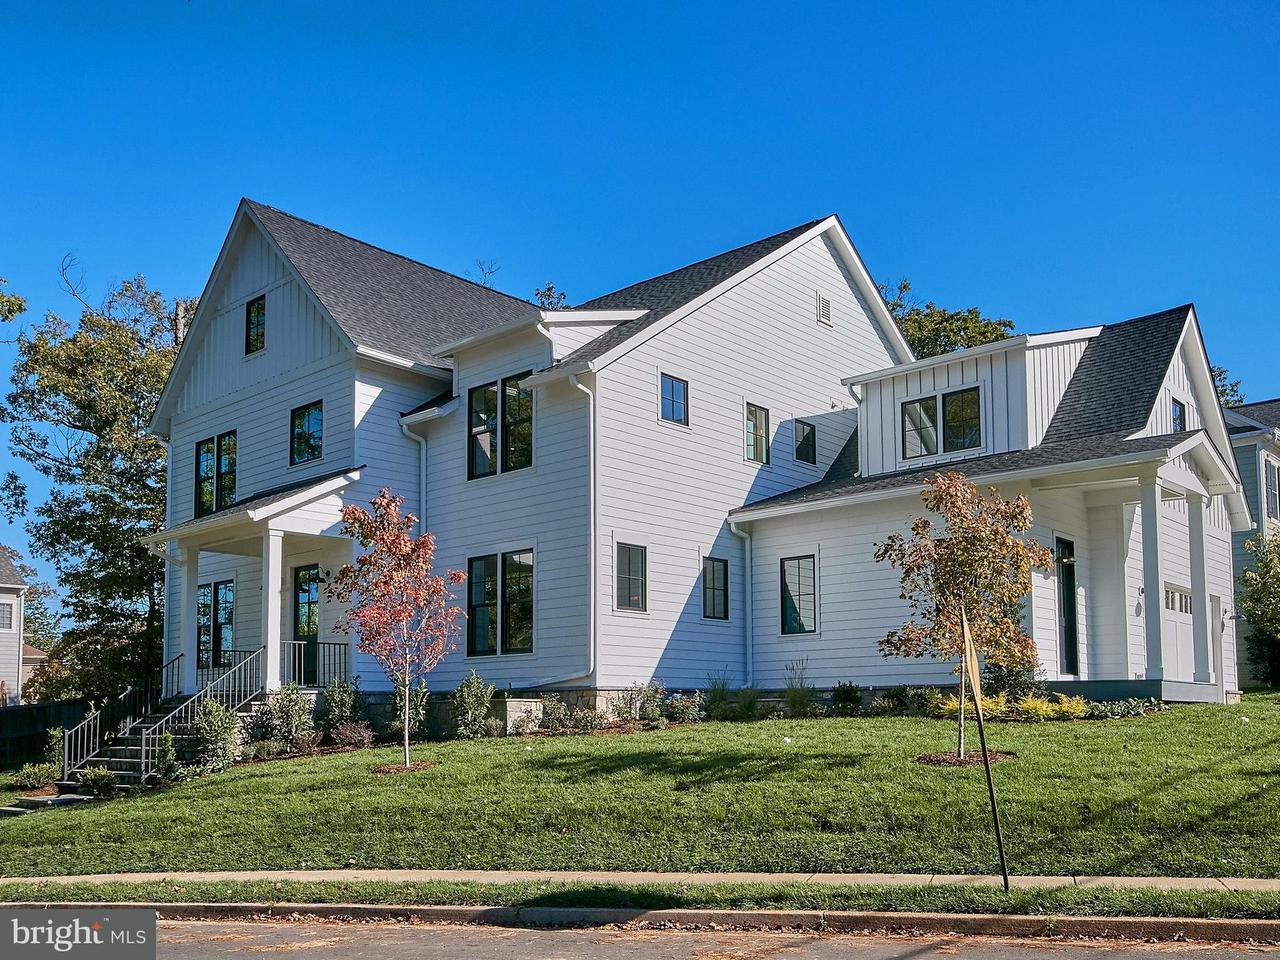 Single Family Home for Sale at 3313 JOHN MARSHALL Drive 3313 JOHN MARSHALL Drive Arlington, Virginia 22207 United States